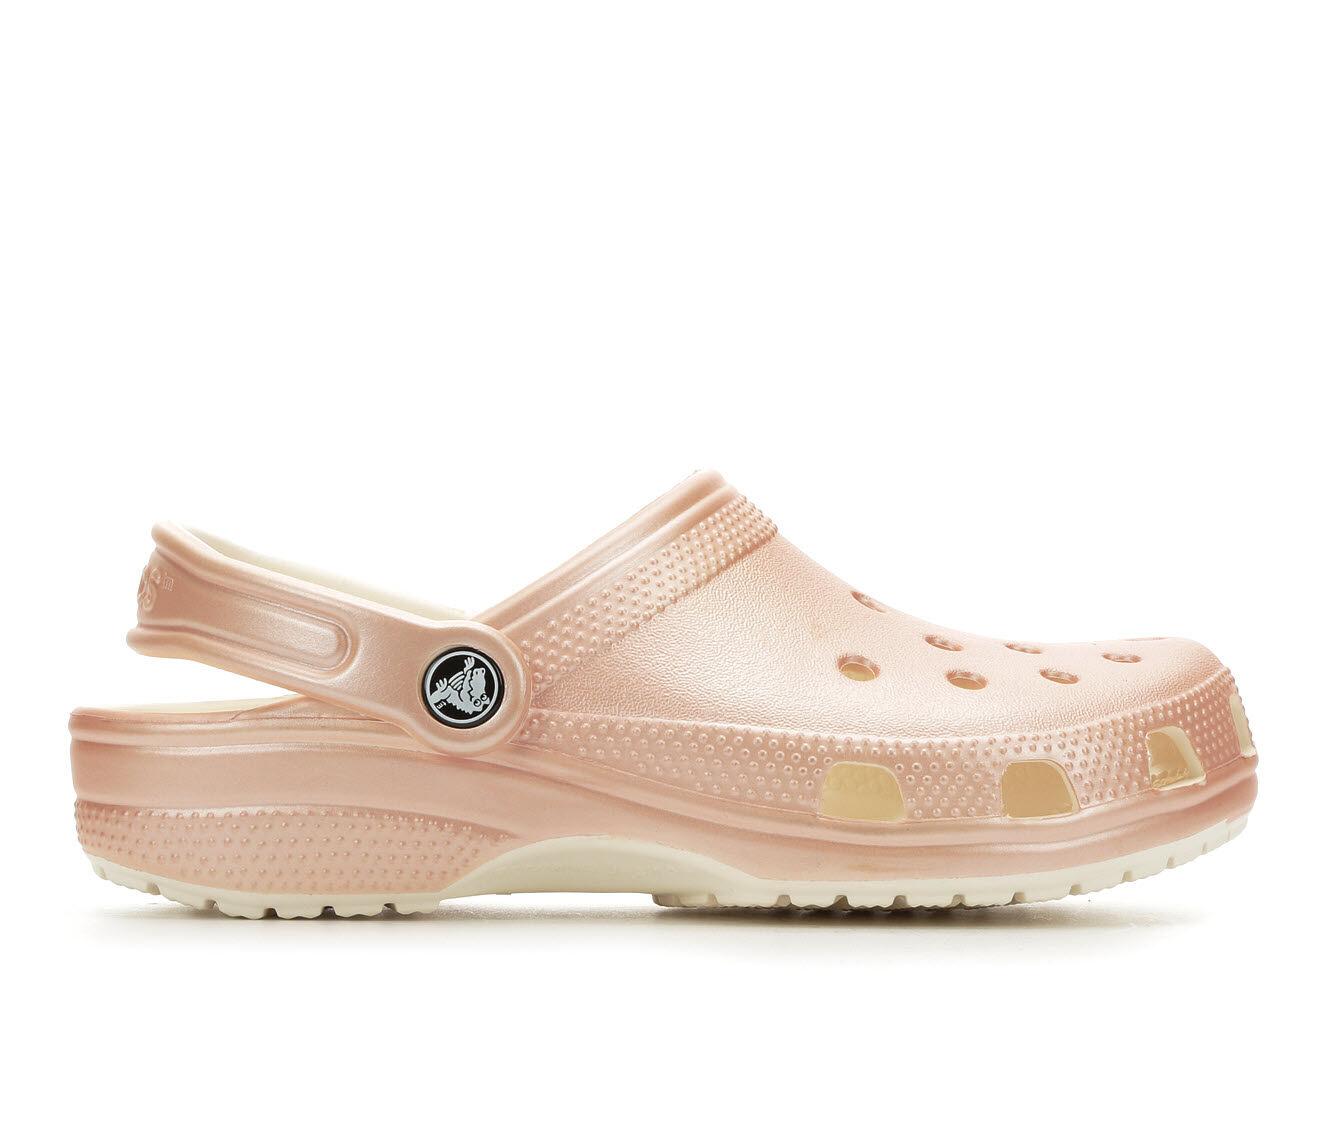 Women's Crocs Classic Clogs Rose Gold